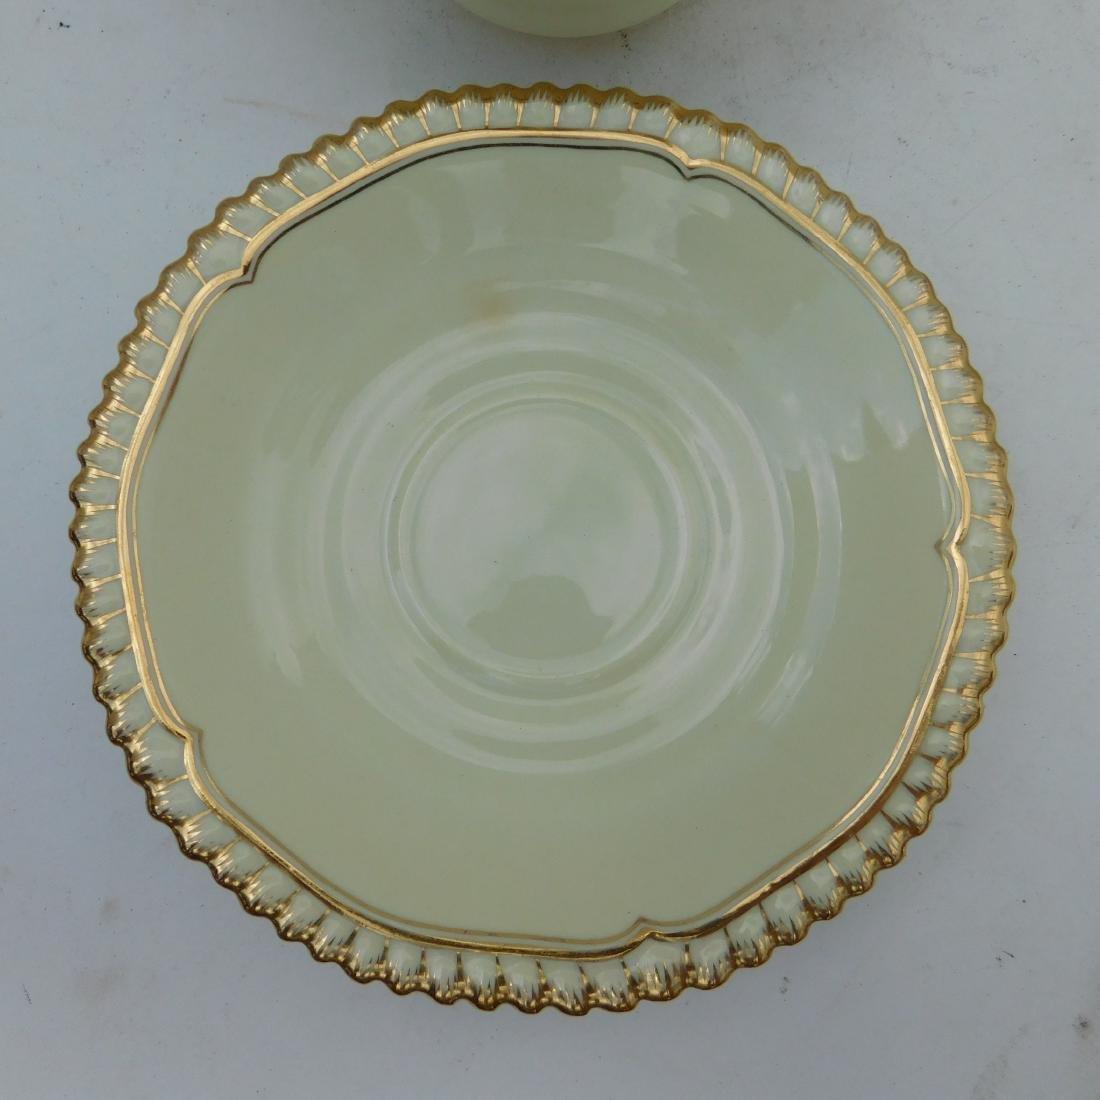 Lot of 10 SPODE Teacups - 2